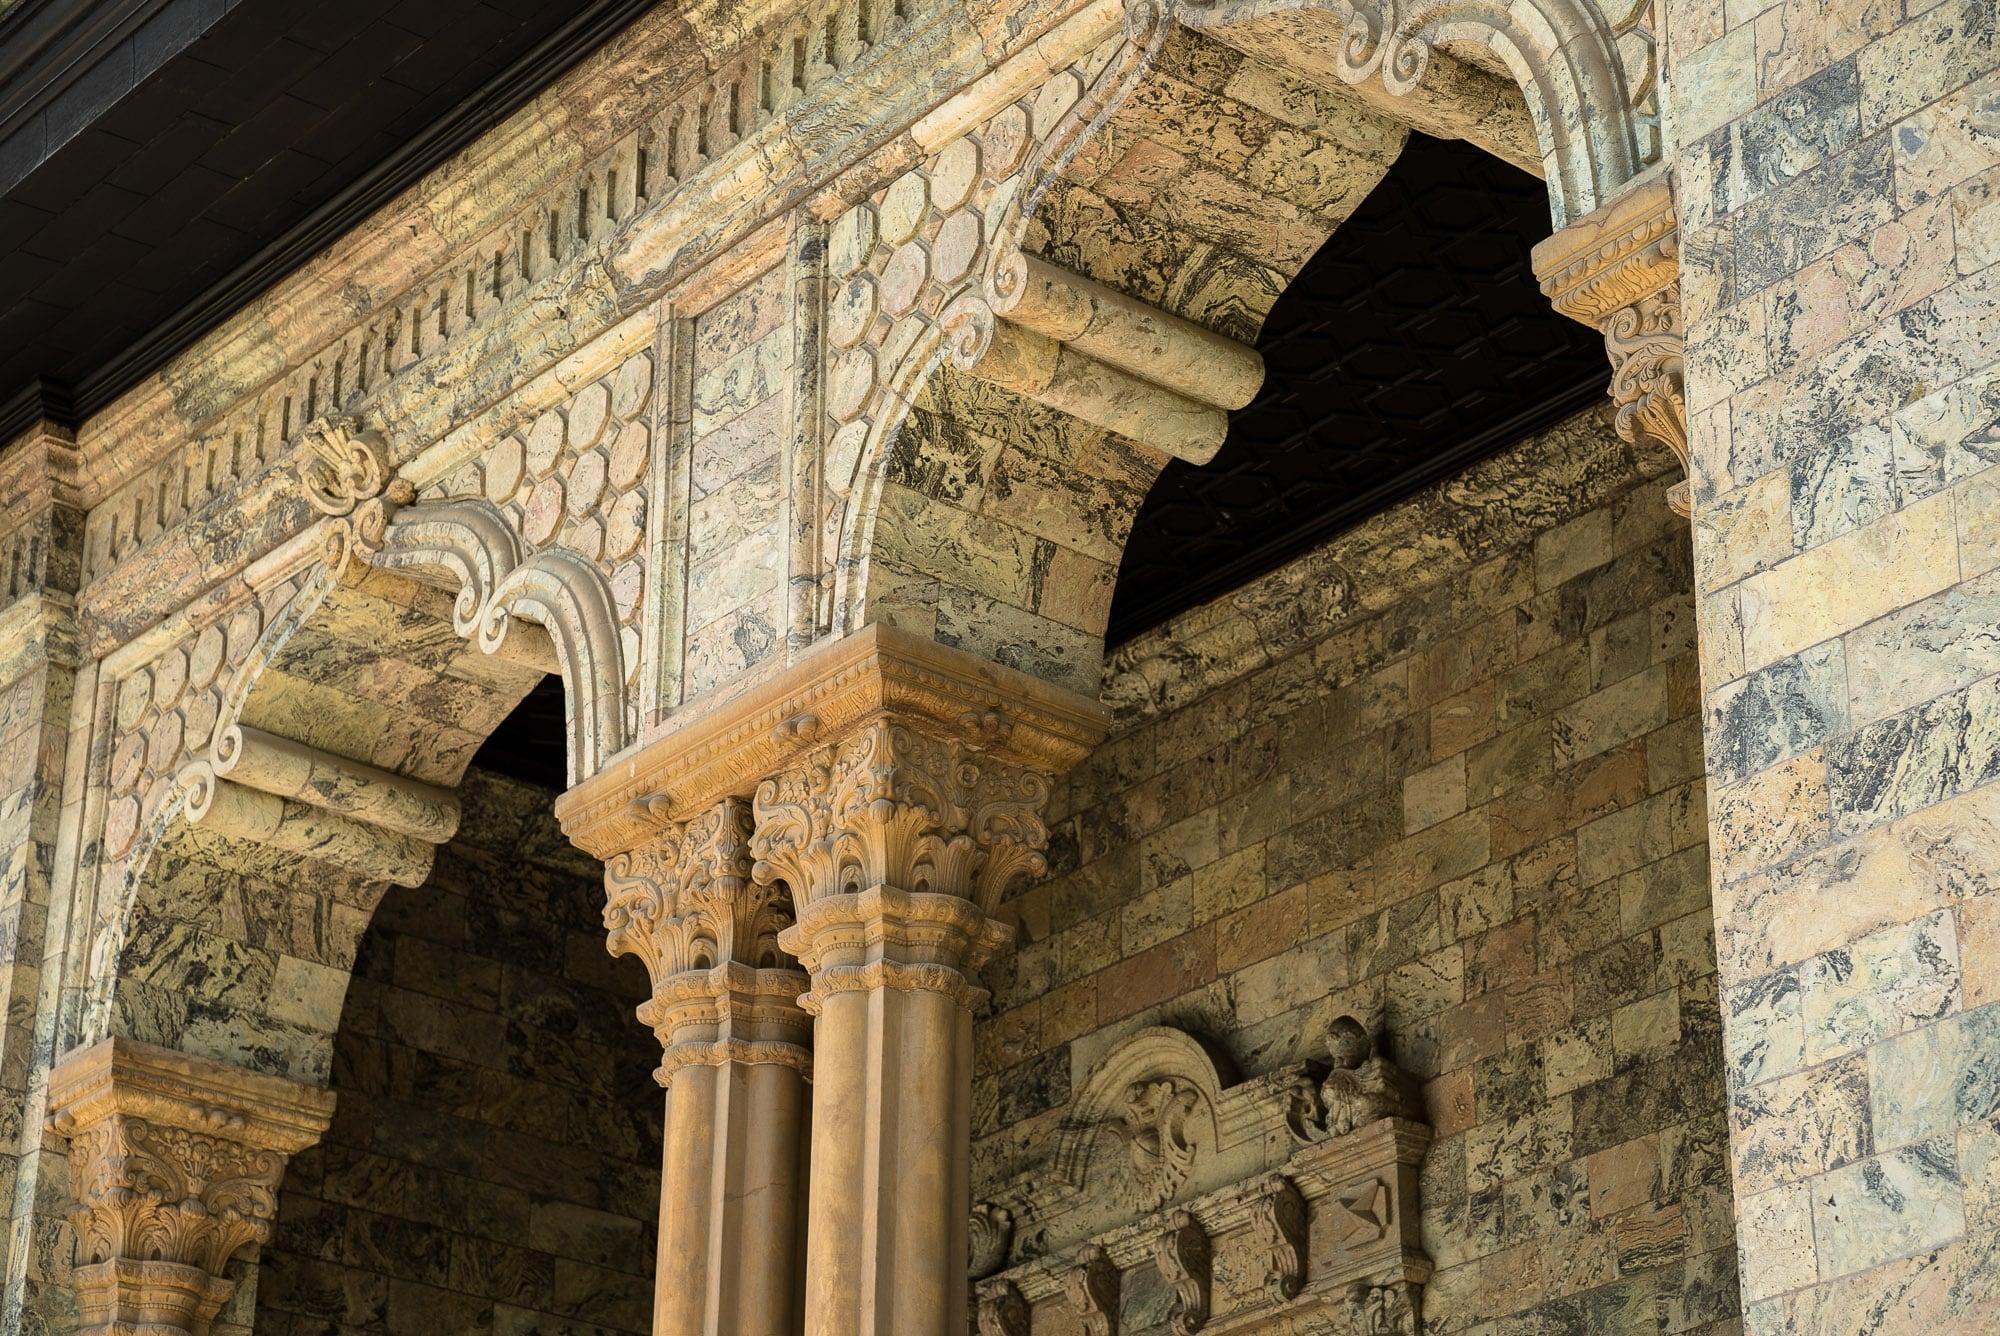 Green Palace detail